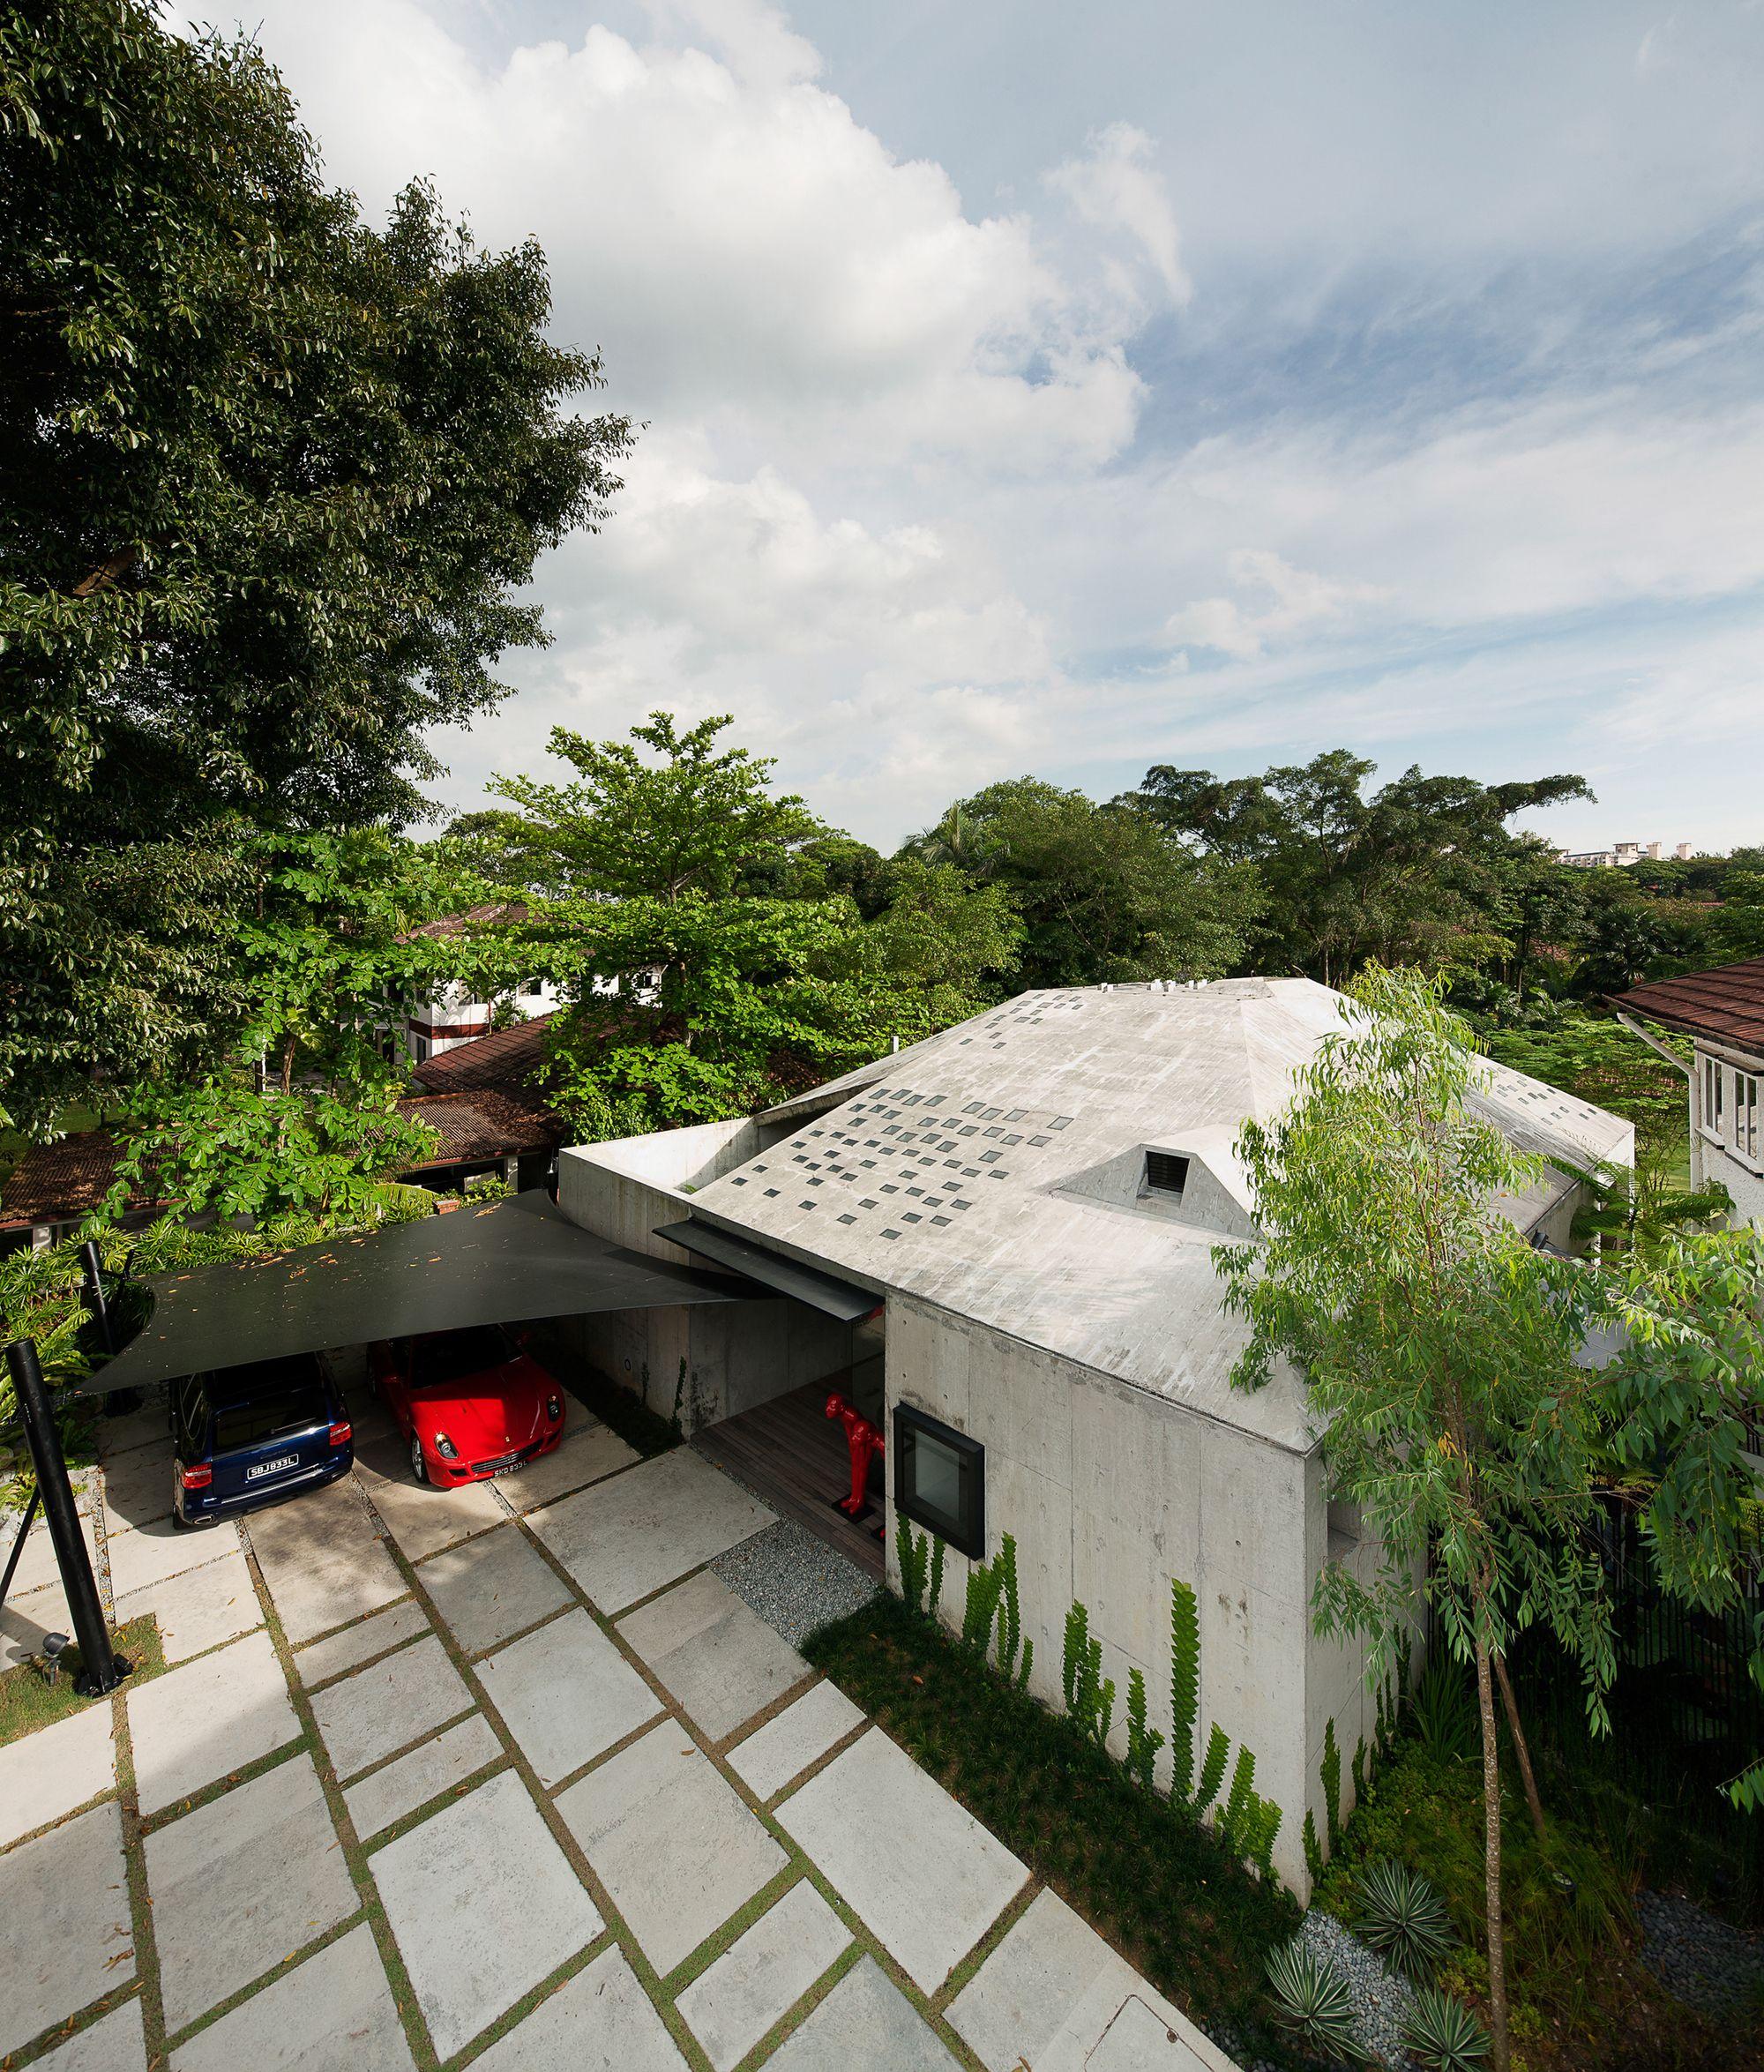 Bungalow Homes For Sale In Brampton: Gallery Of 9 Leedon Park / Ipli Architects